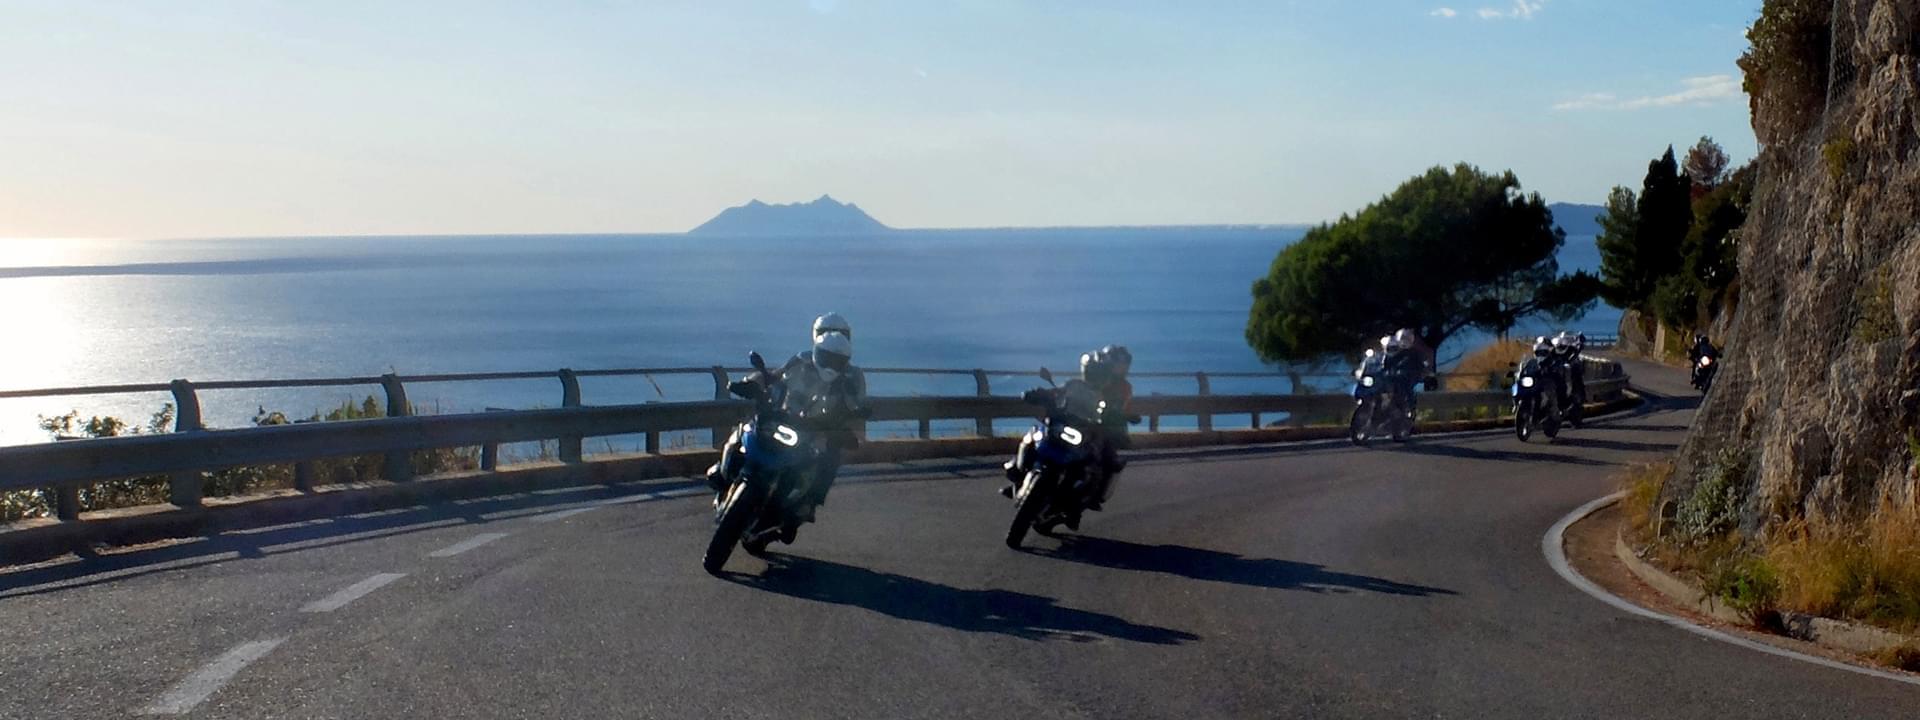 BMW riders along a beautiful Italian coastline road